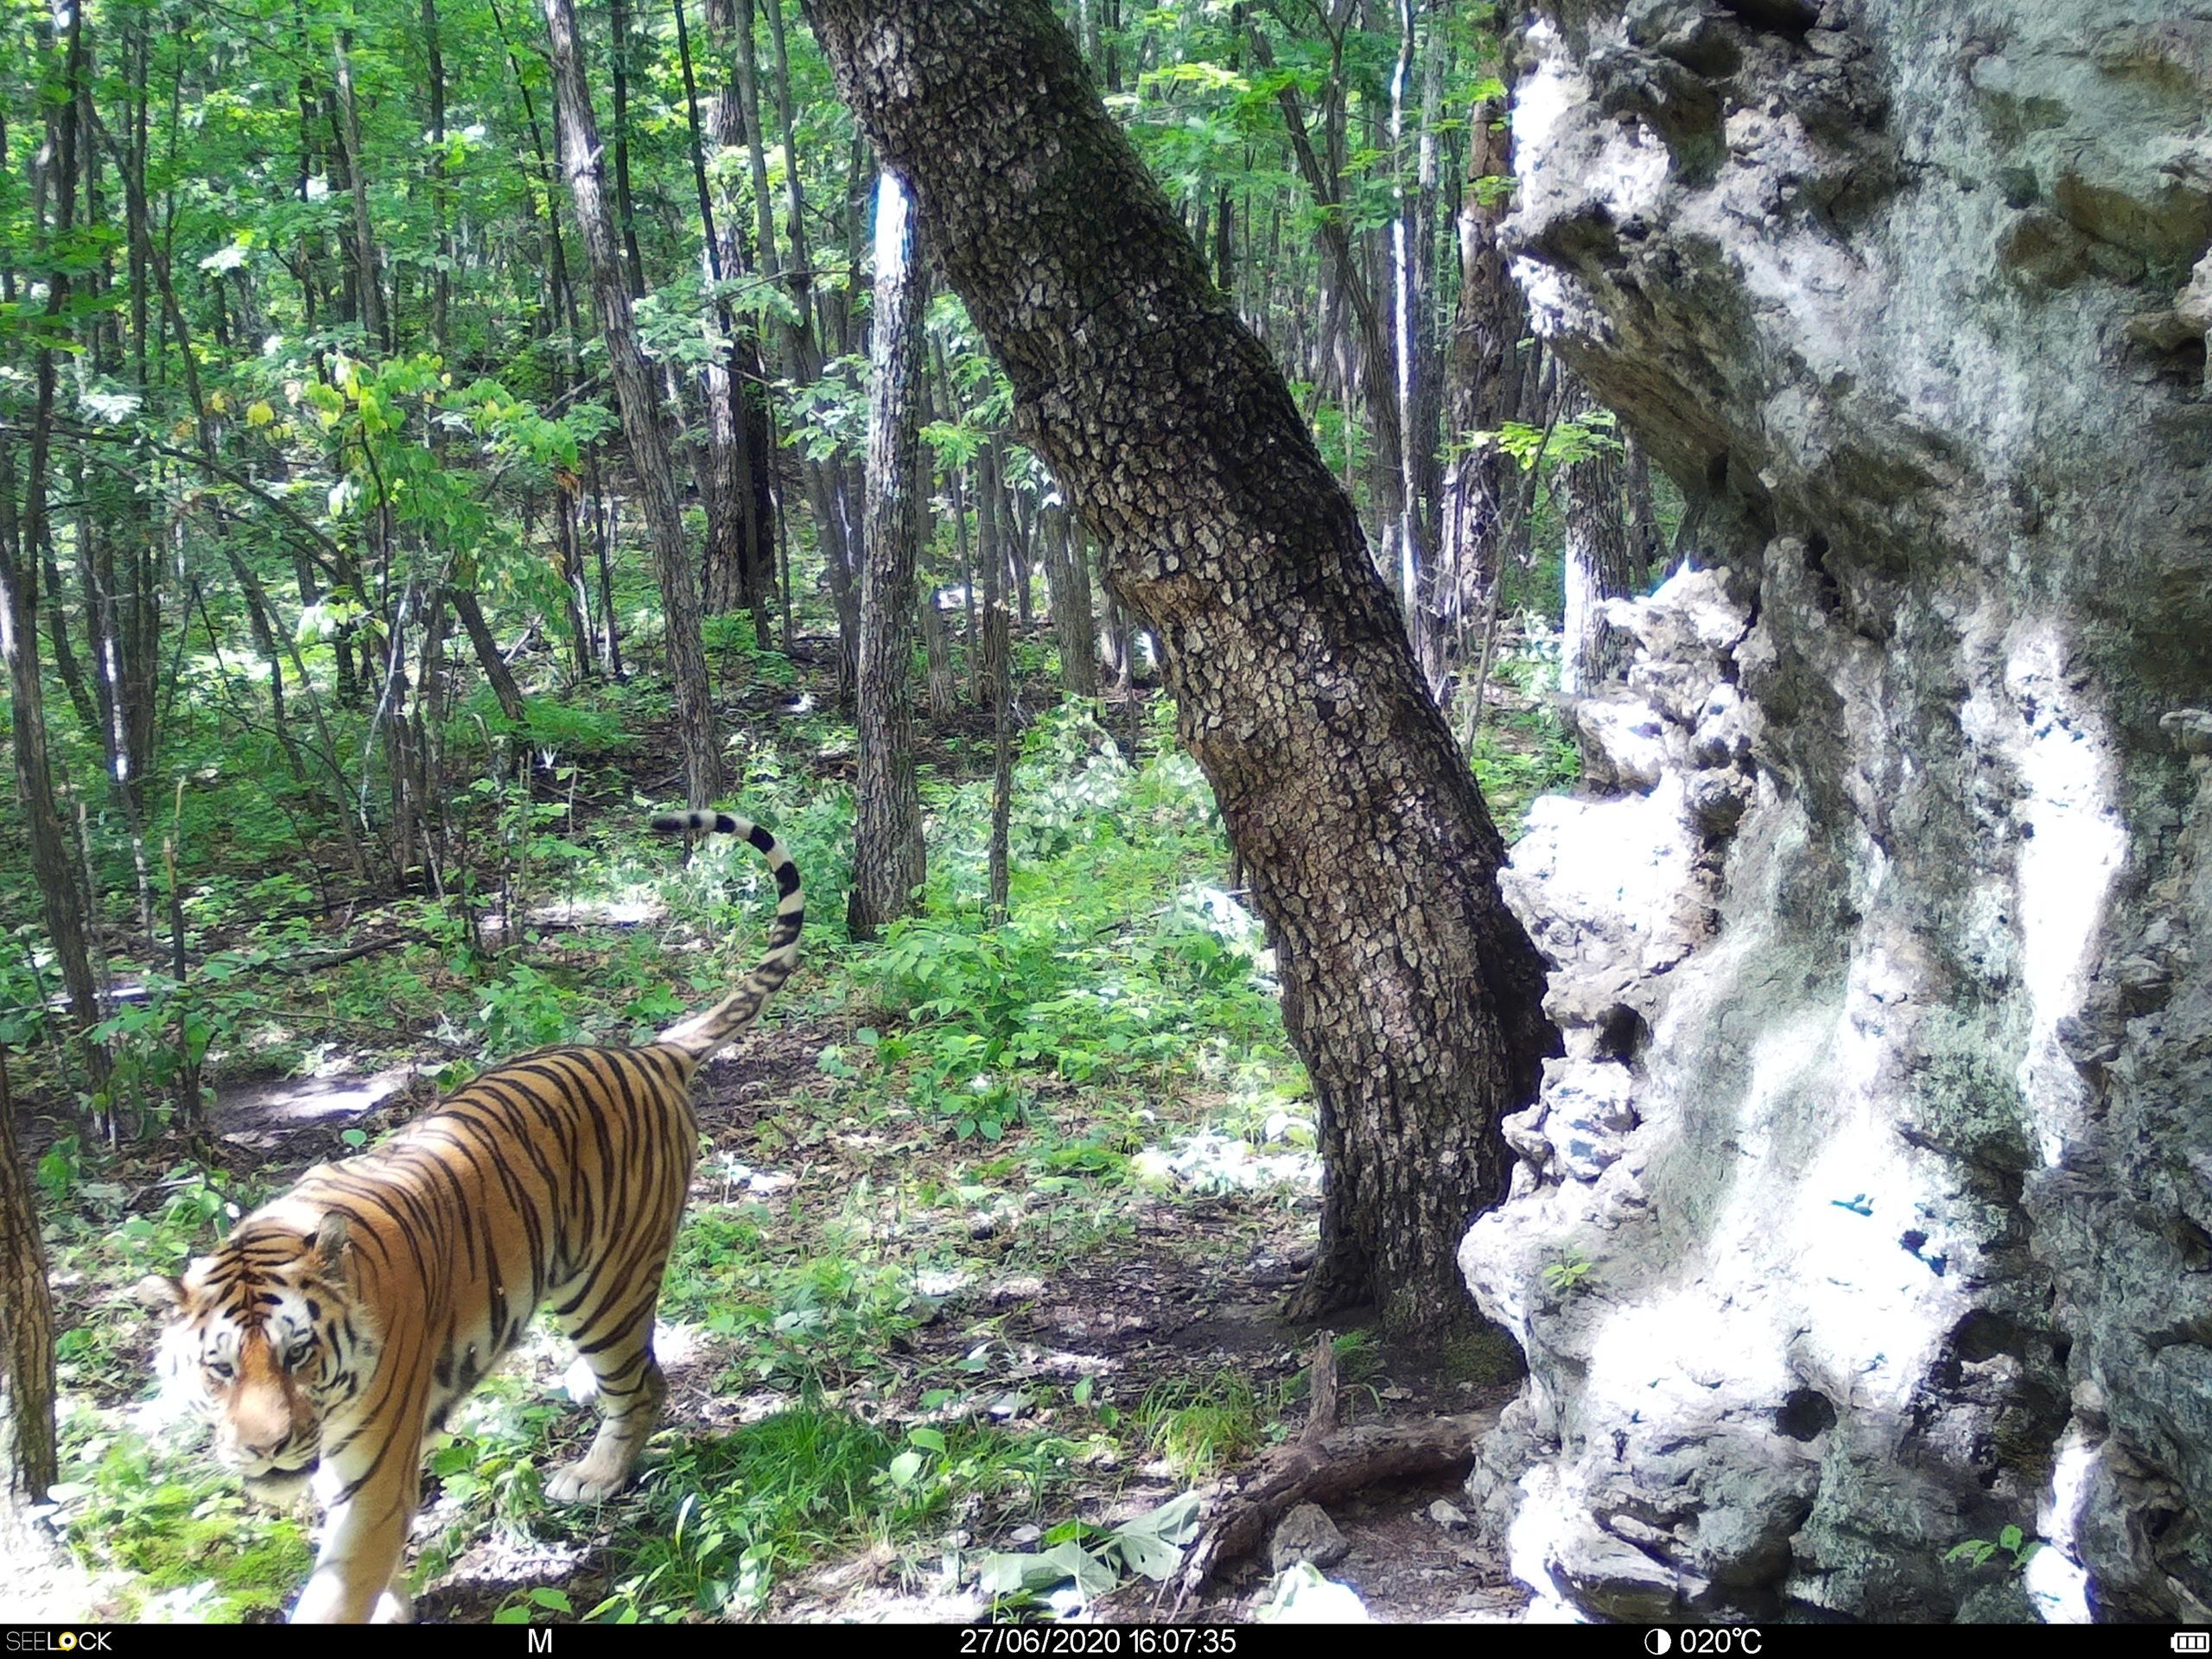 тигр в природе